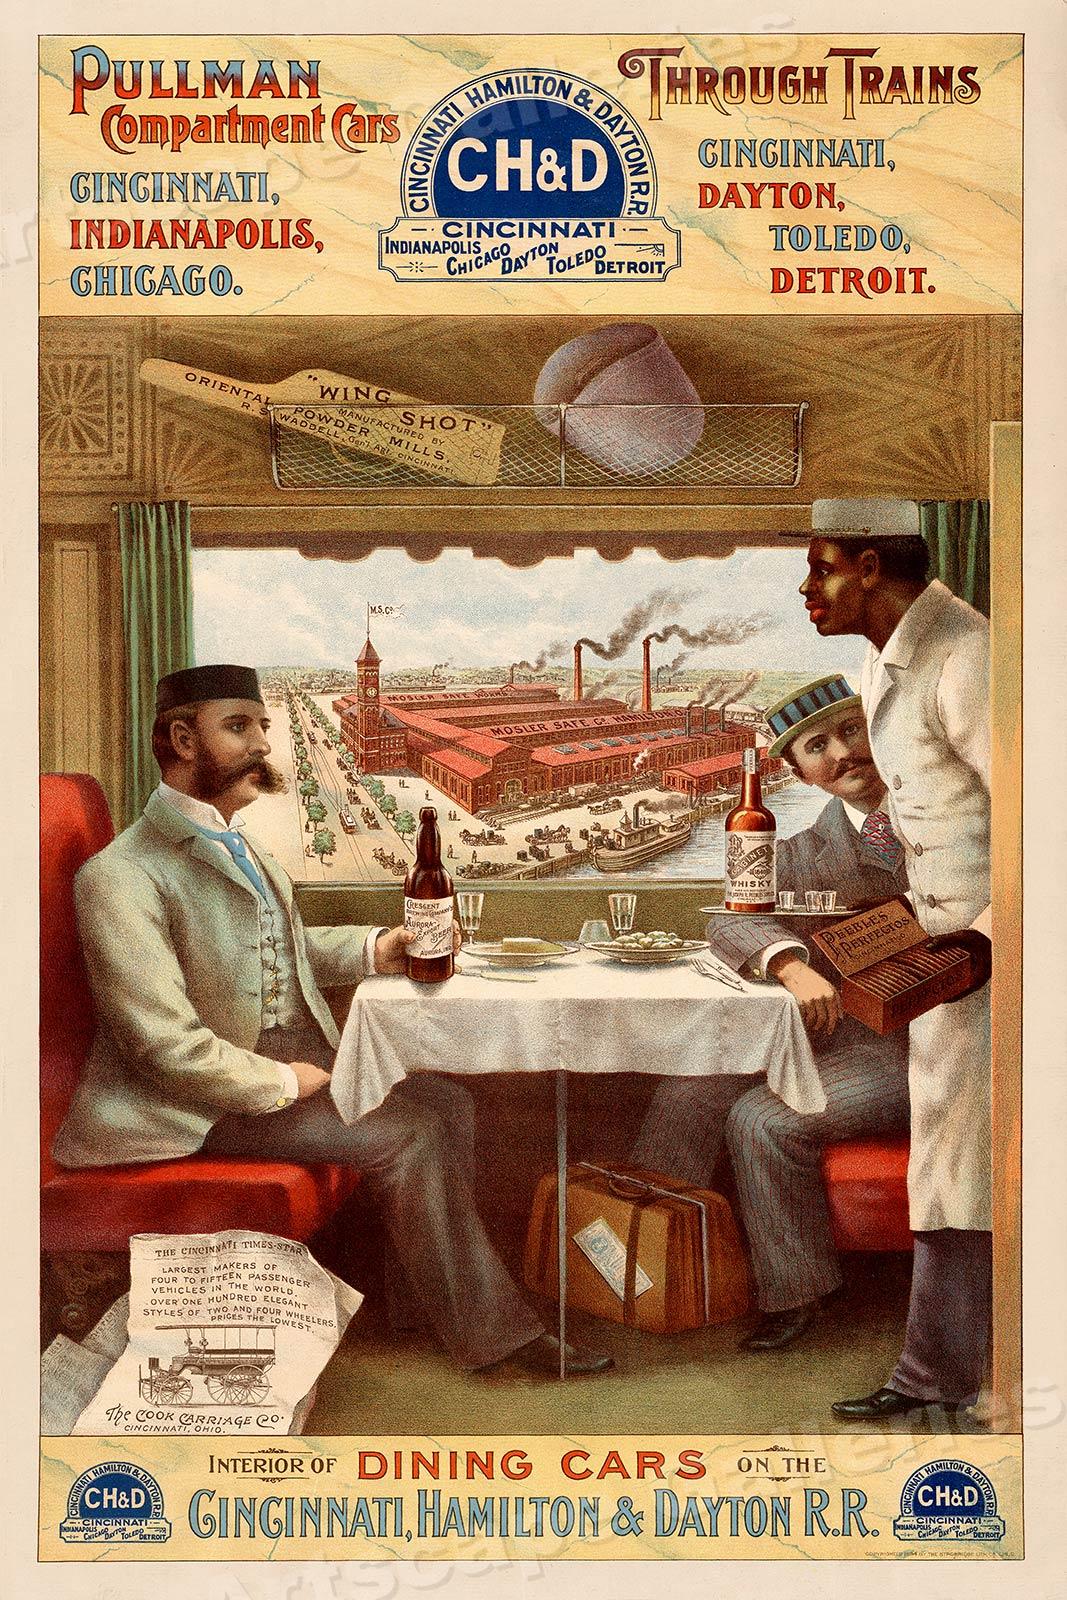 16x24 1890s Pullman Train Dining Car Classic Railroad Advertisement Poster